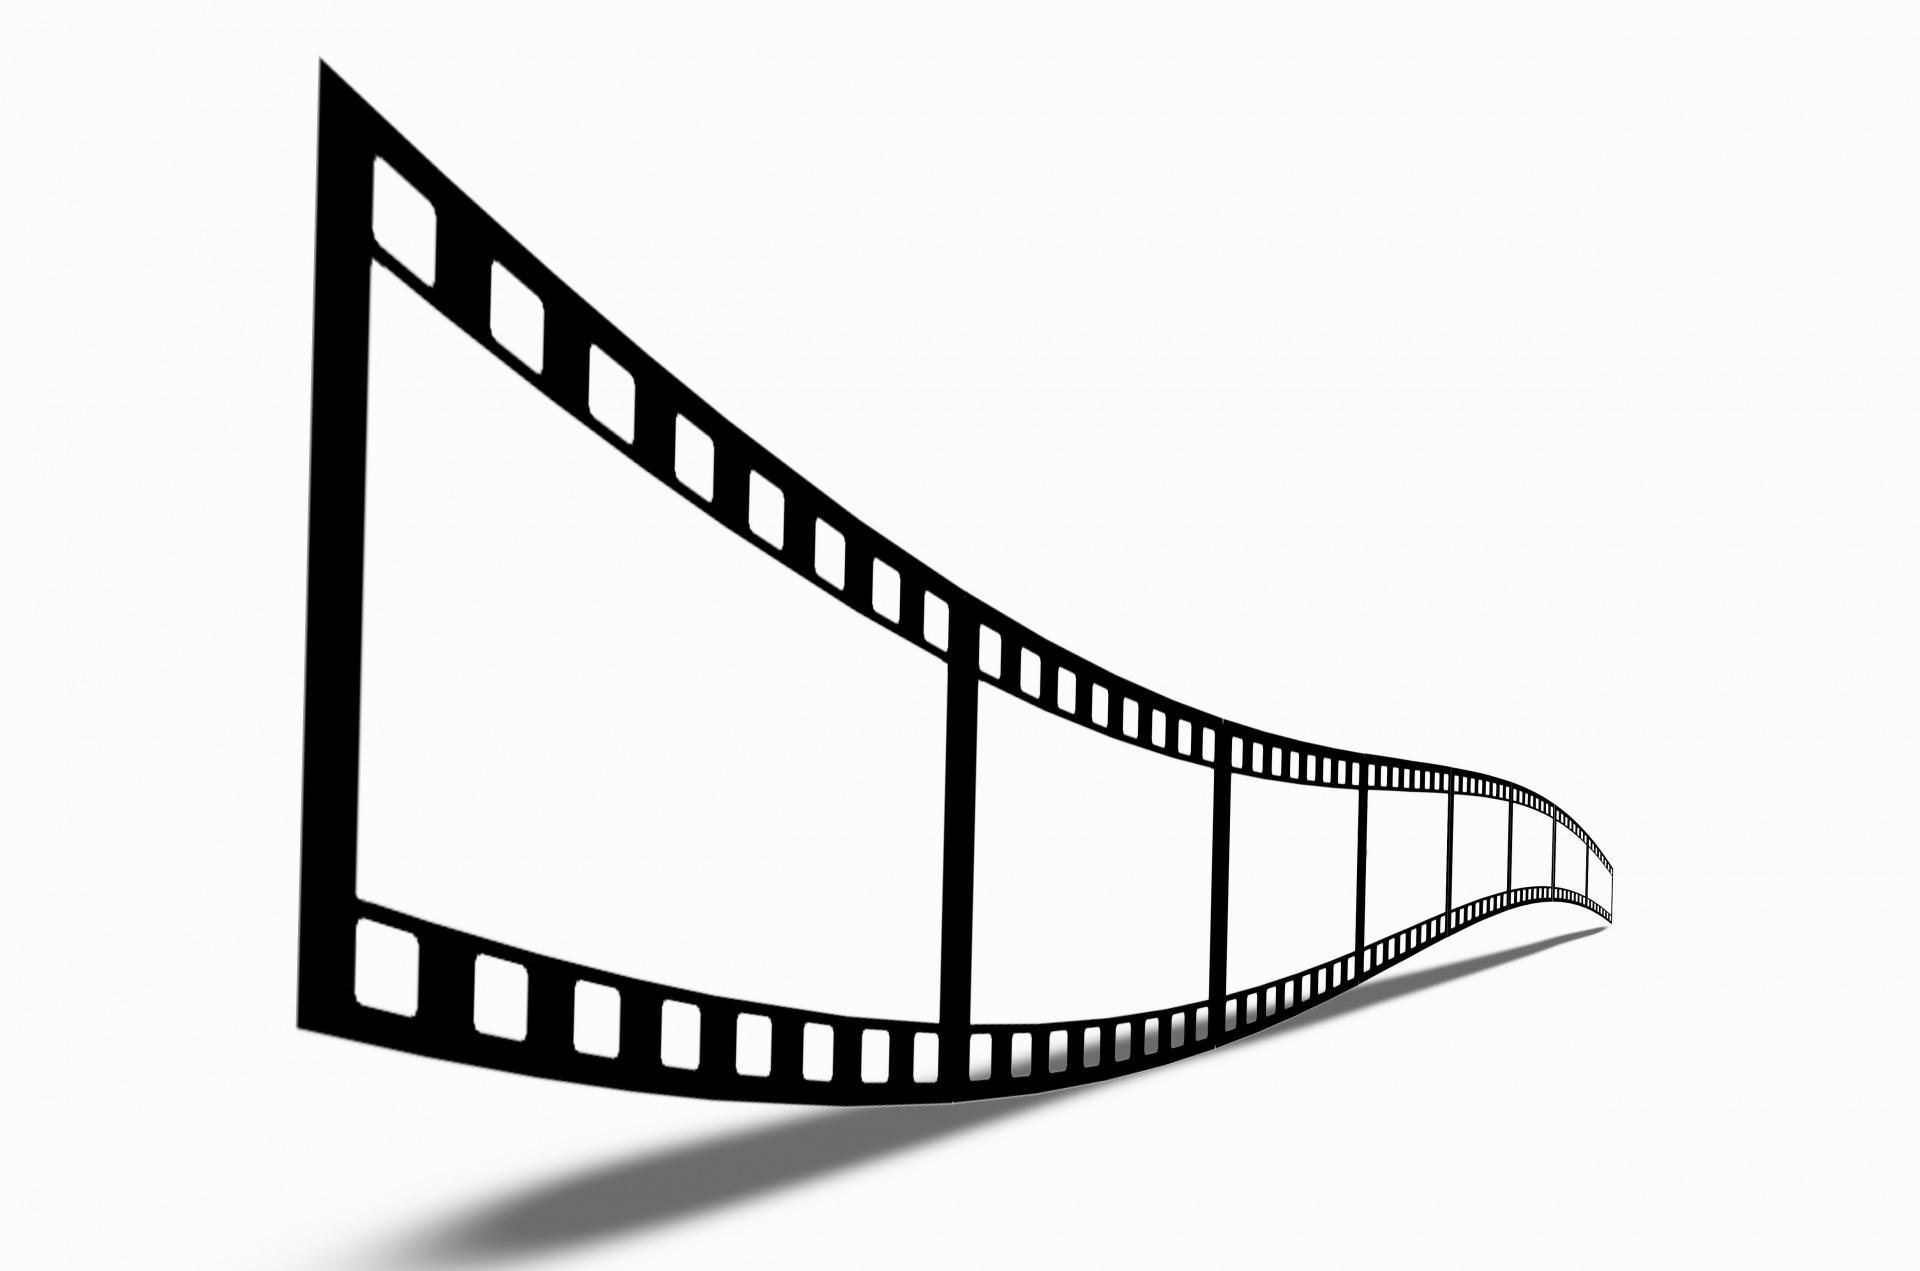 1920x1271 Film Strip